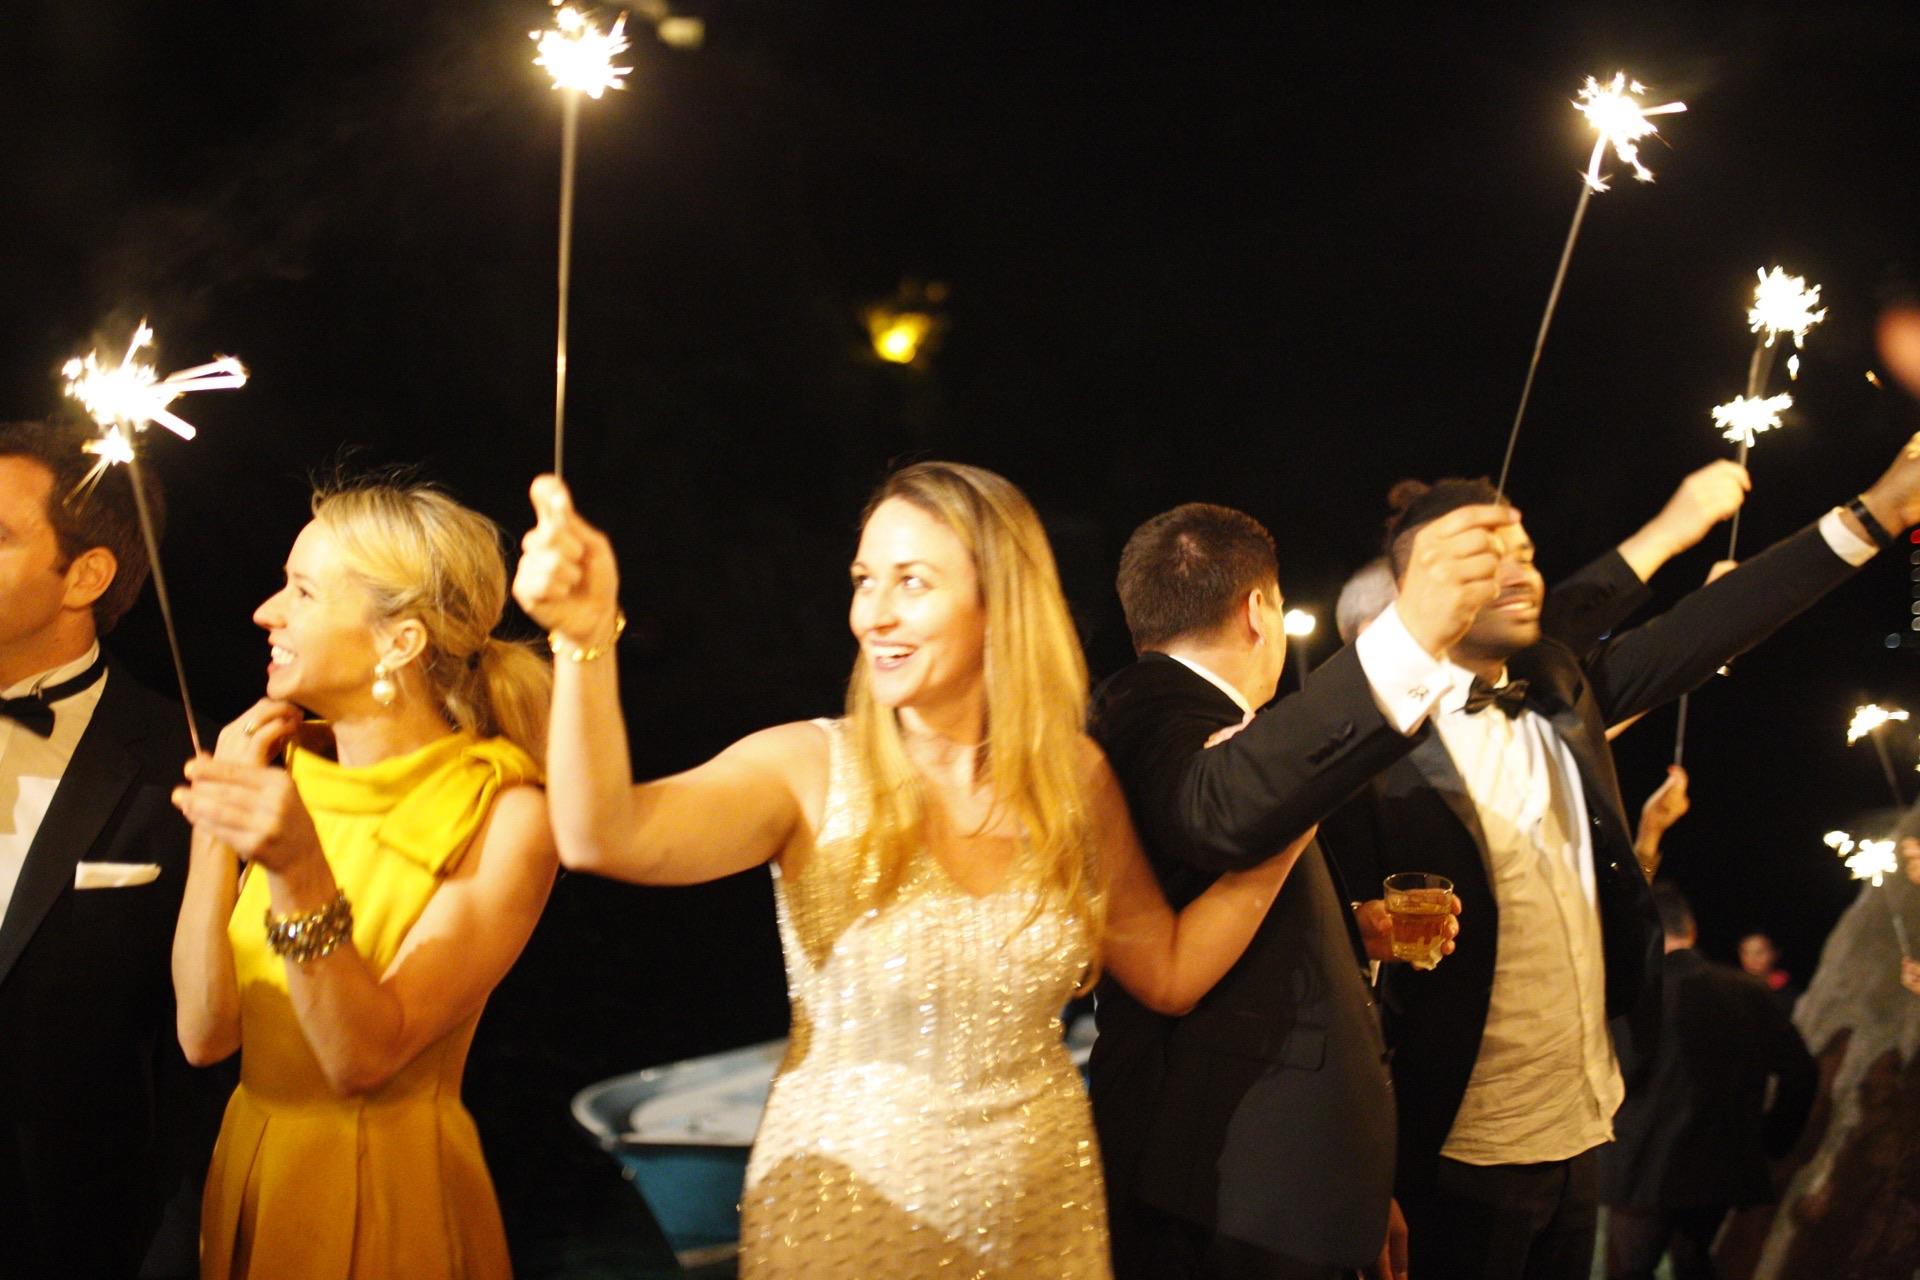 https://www.weddingamalfi.com/wp-content/uploads/Nathalie-and-Benjamin-Wedding-in-Positano-Italy-25.jpg